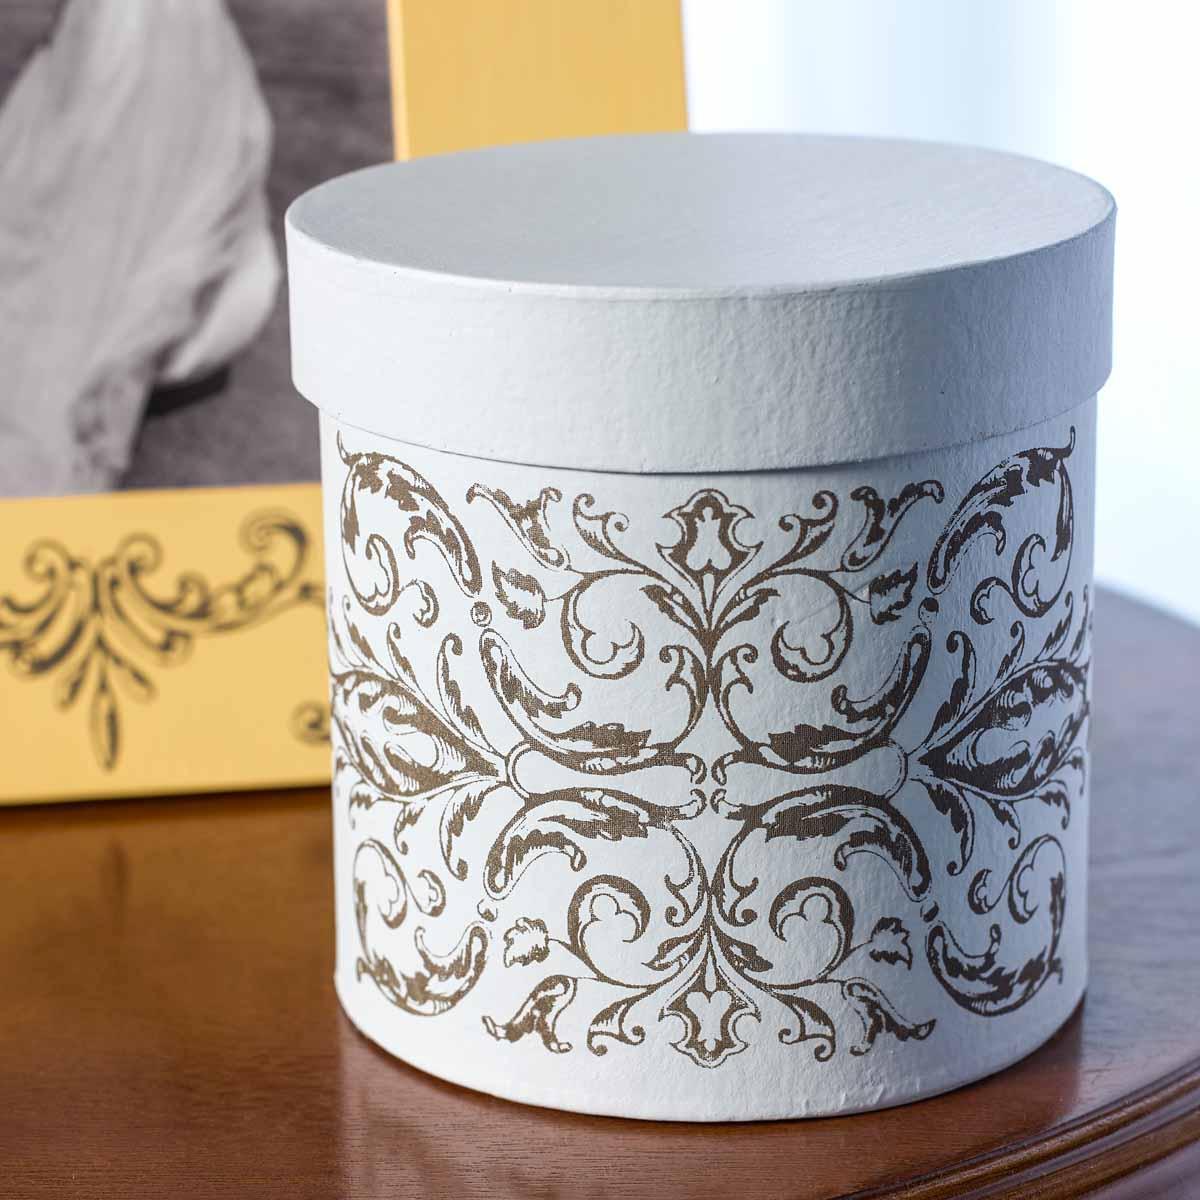 FolkArt ® Adhesive Silkscreen - Filigree - 34701